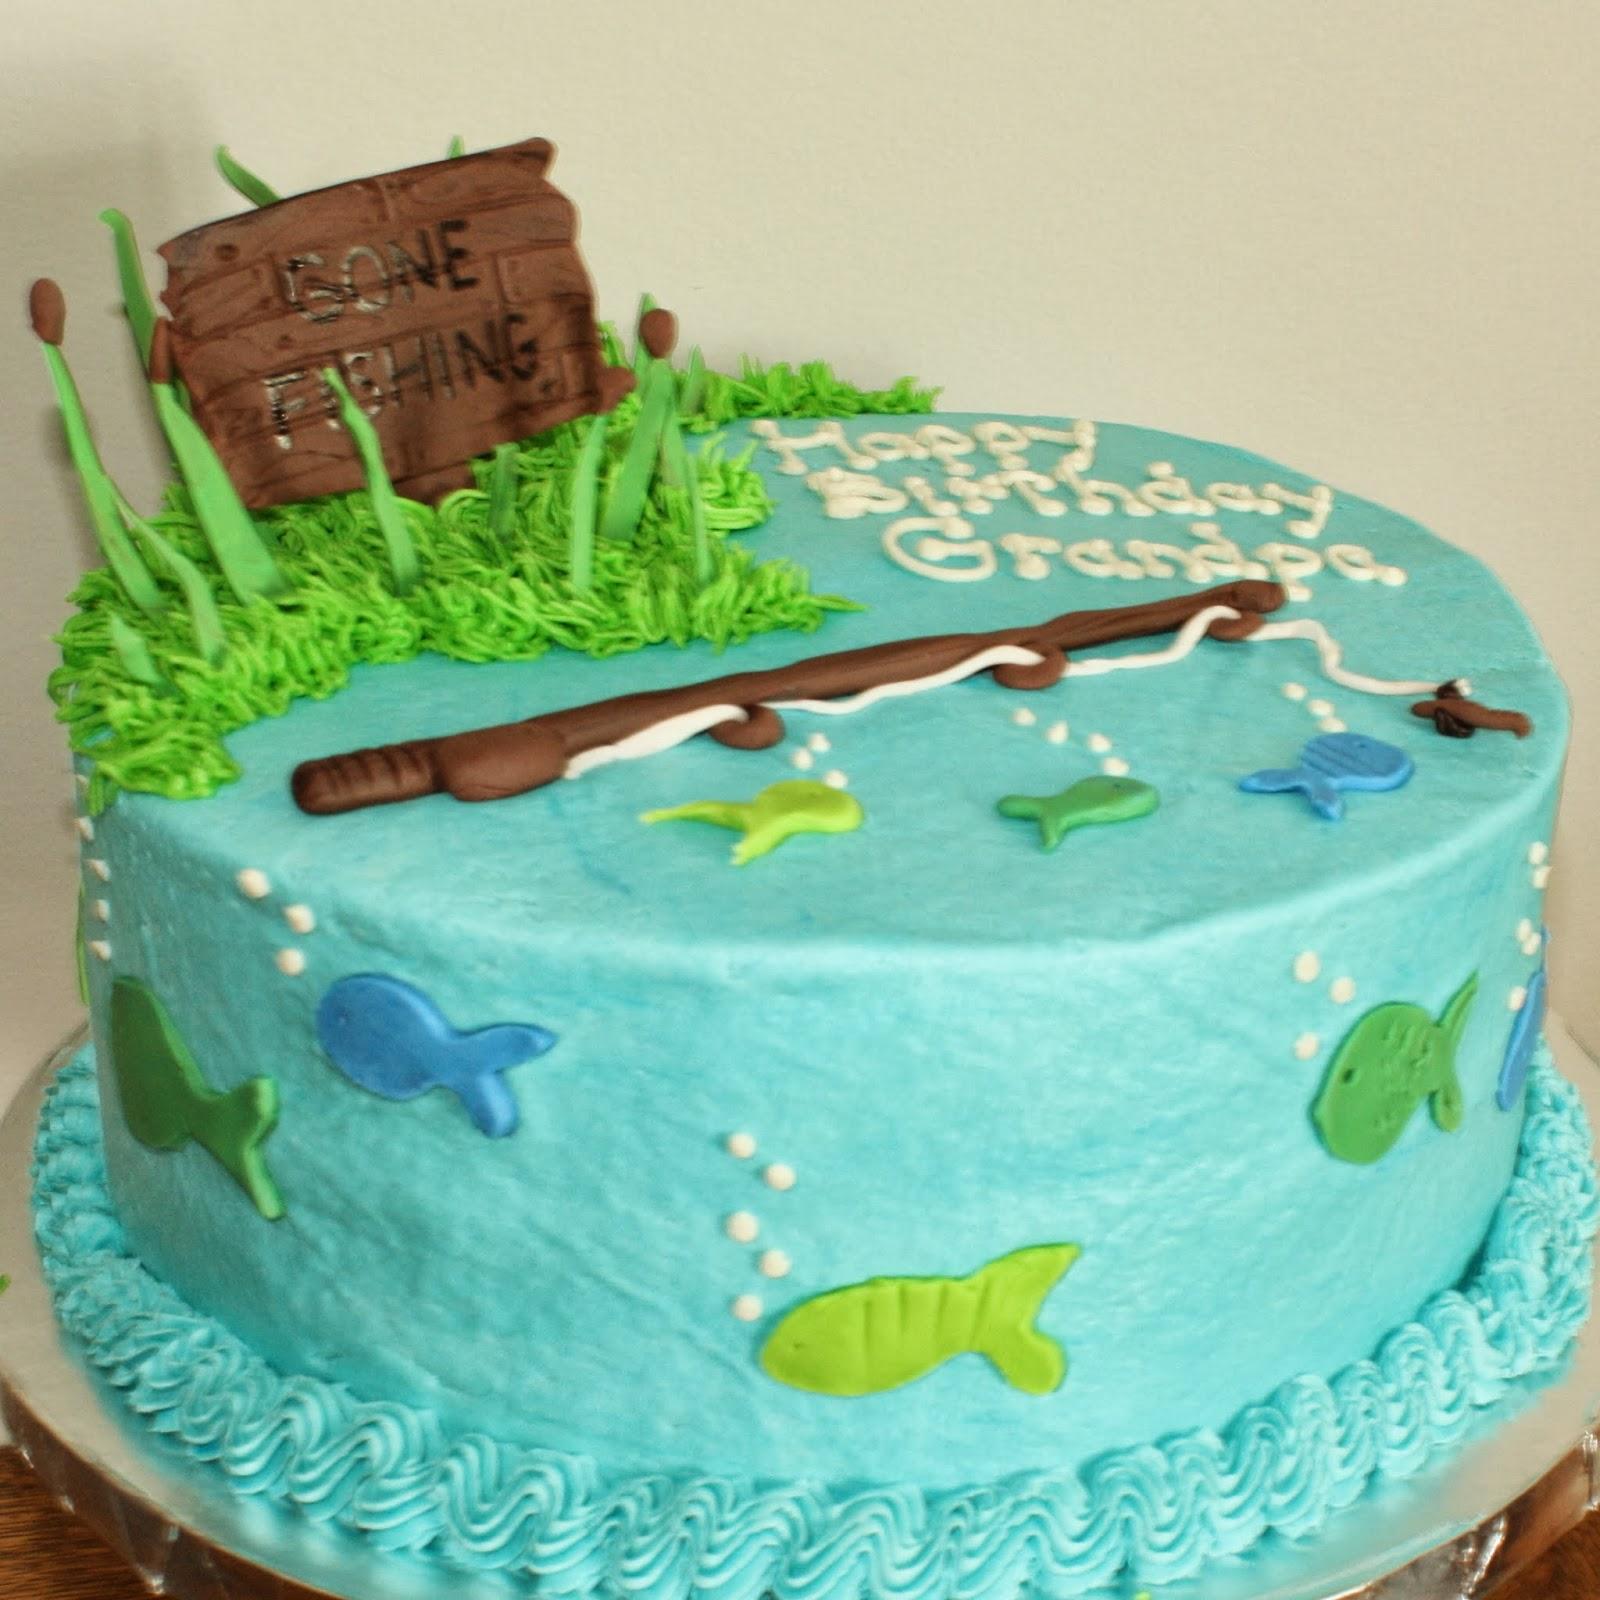 14x70 Mobile Home Floor Plan Kake Fishing Cake